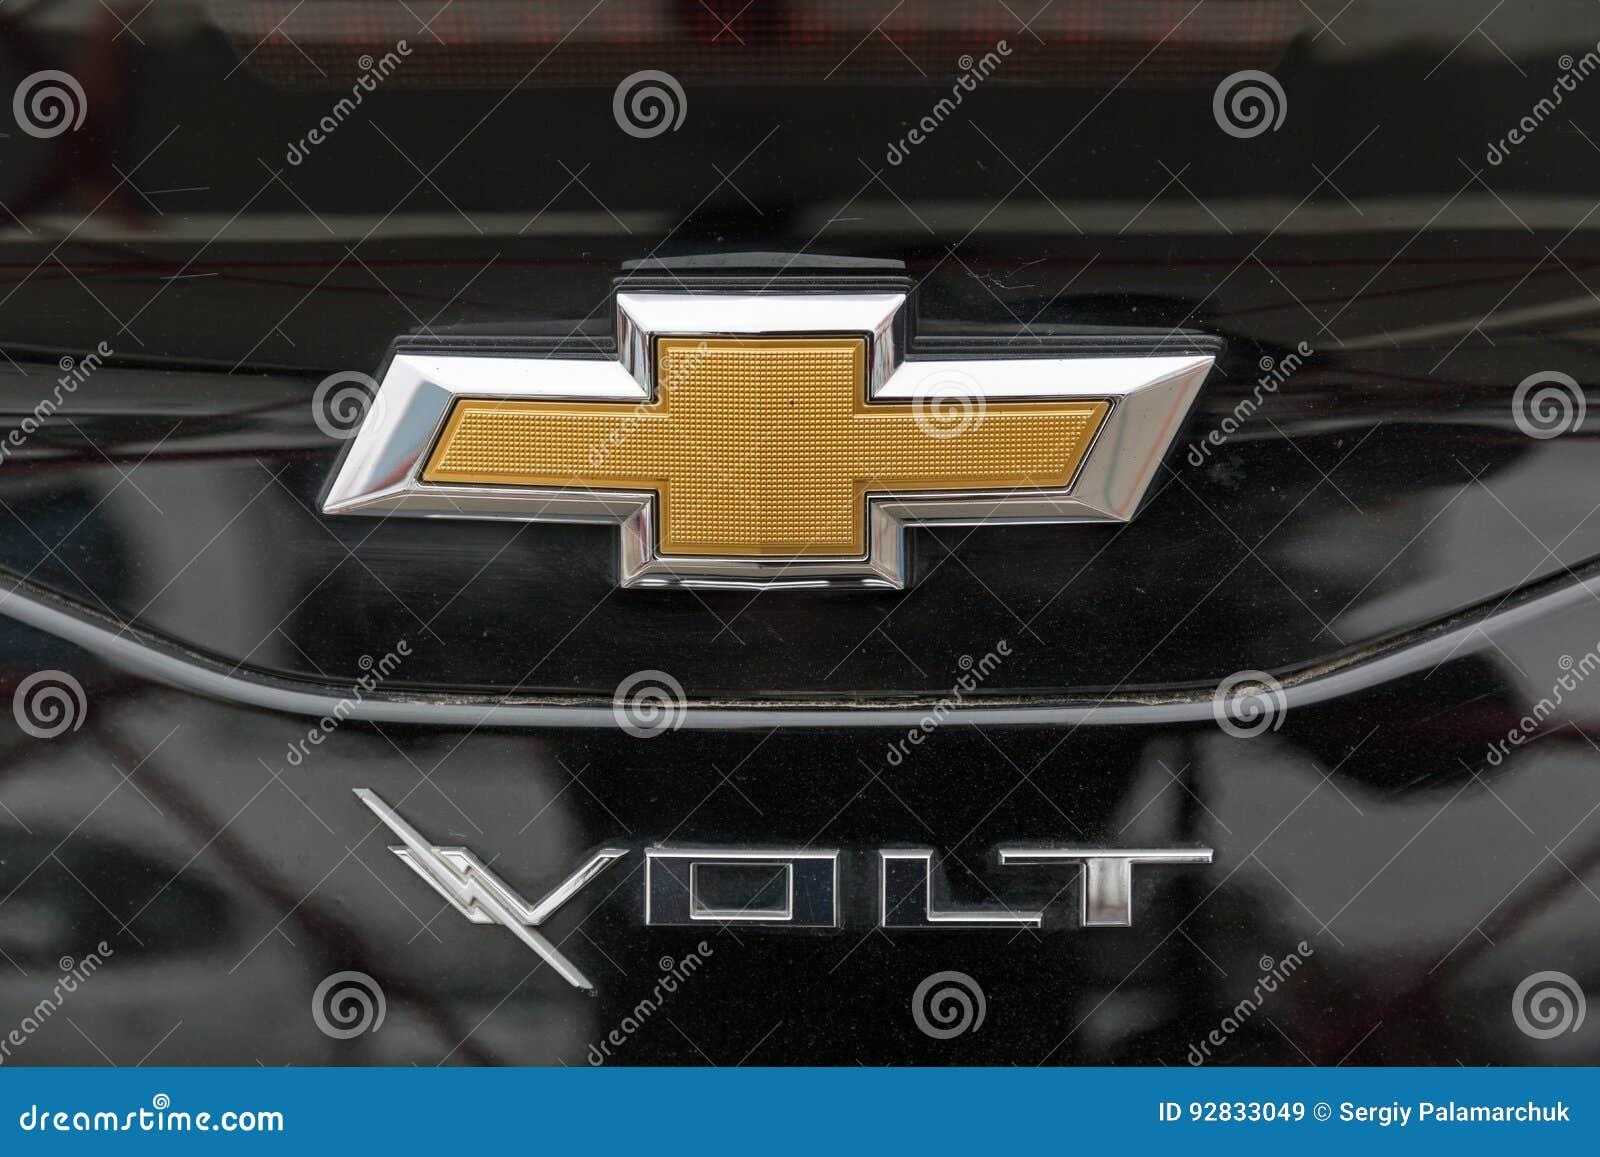 Chevrolet Volt Electric Car On Kiev Plug In Ukraine 2017 Exhibition Chevy